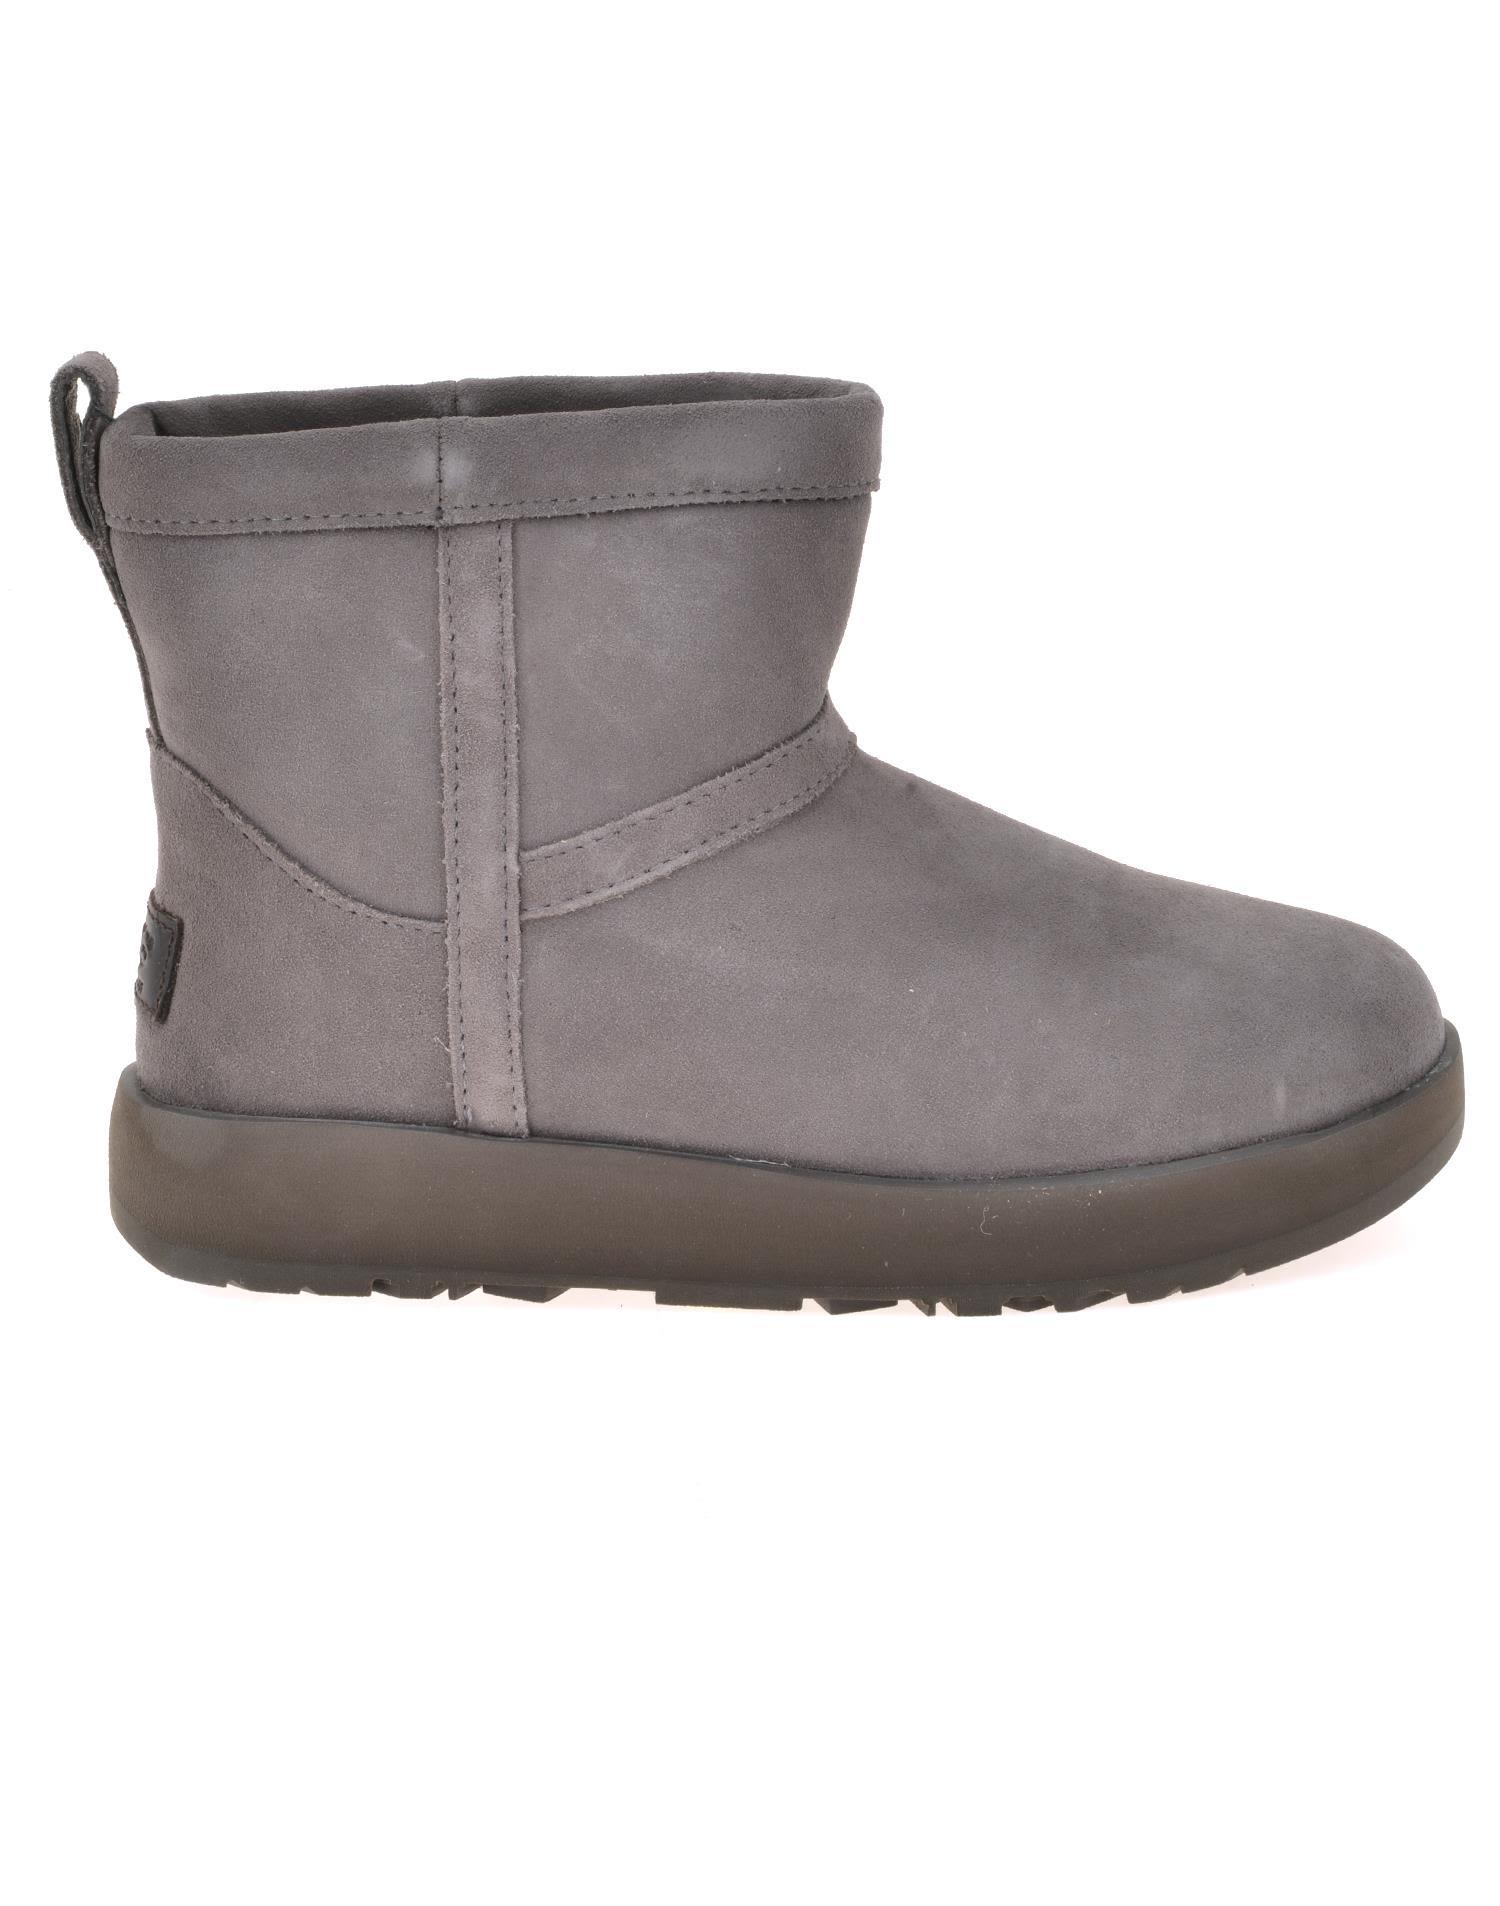 UGG Classic Mini Waterproof Boot